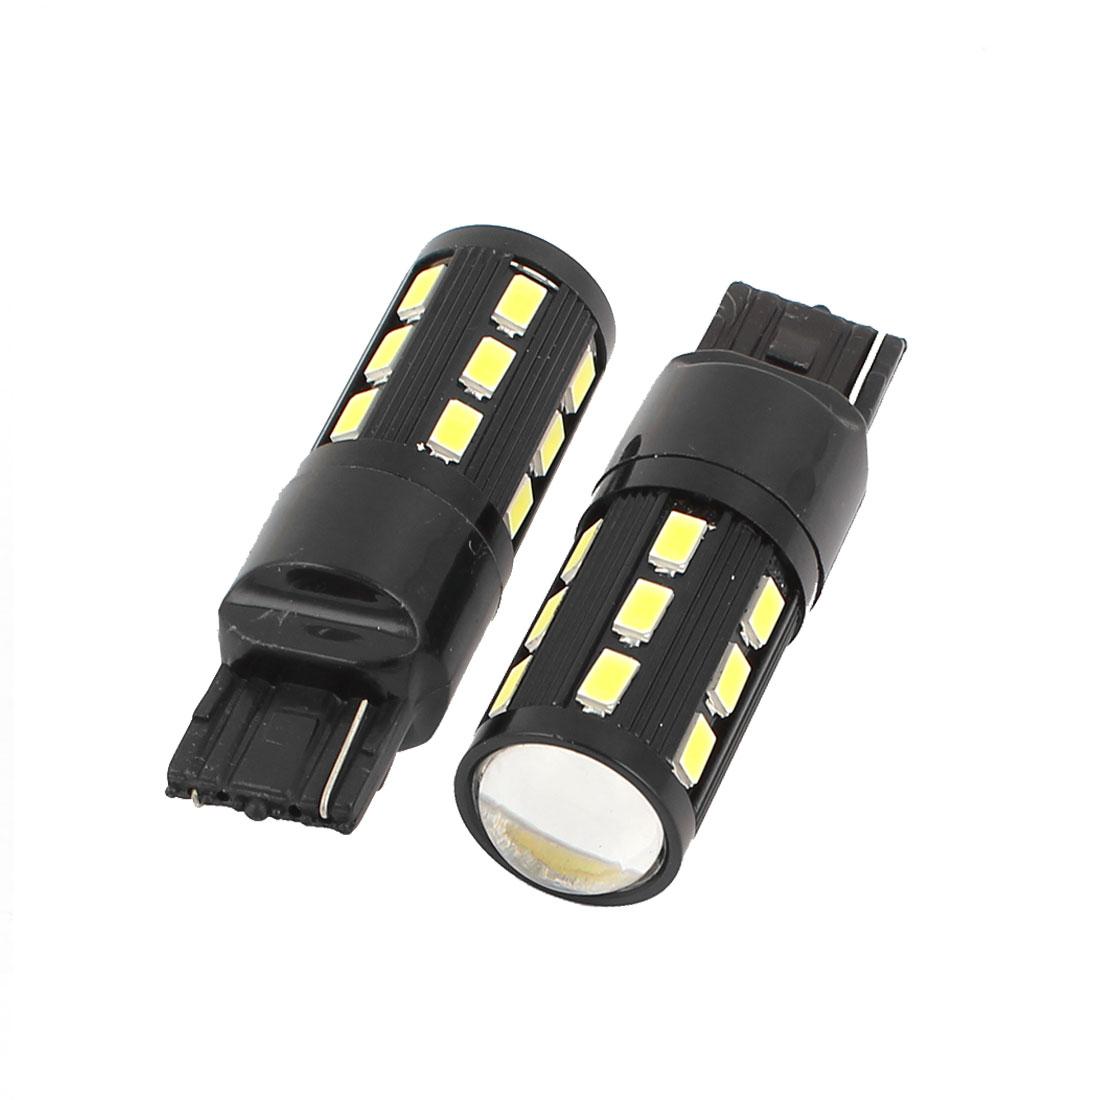 2 Pcs W21W WY21W 7440 992 5630 SMD 19 LED Turn Signal Rear Light Bulb Lamp White